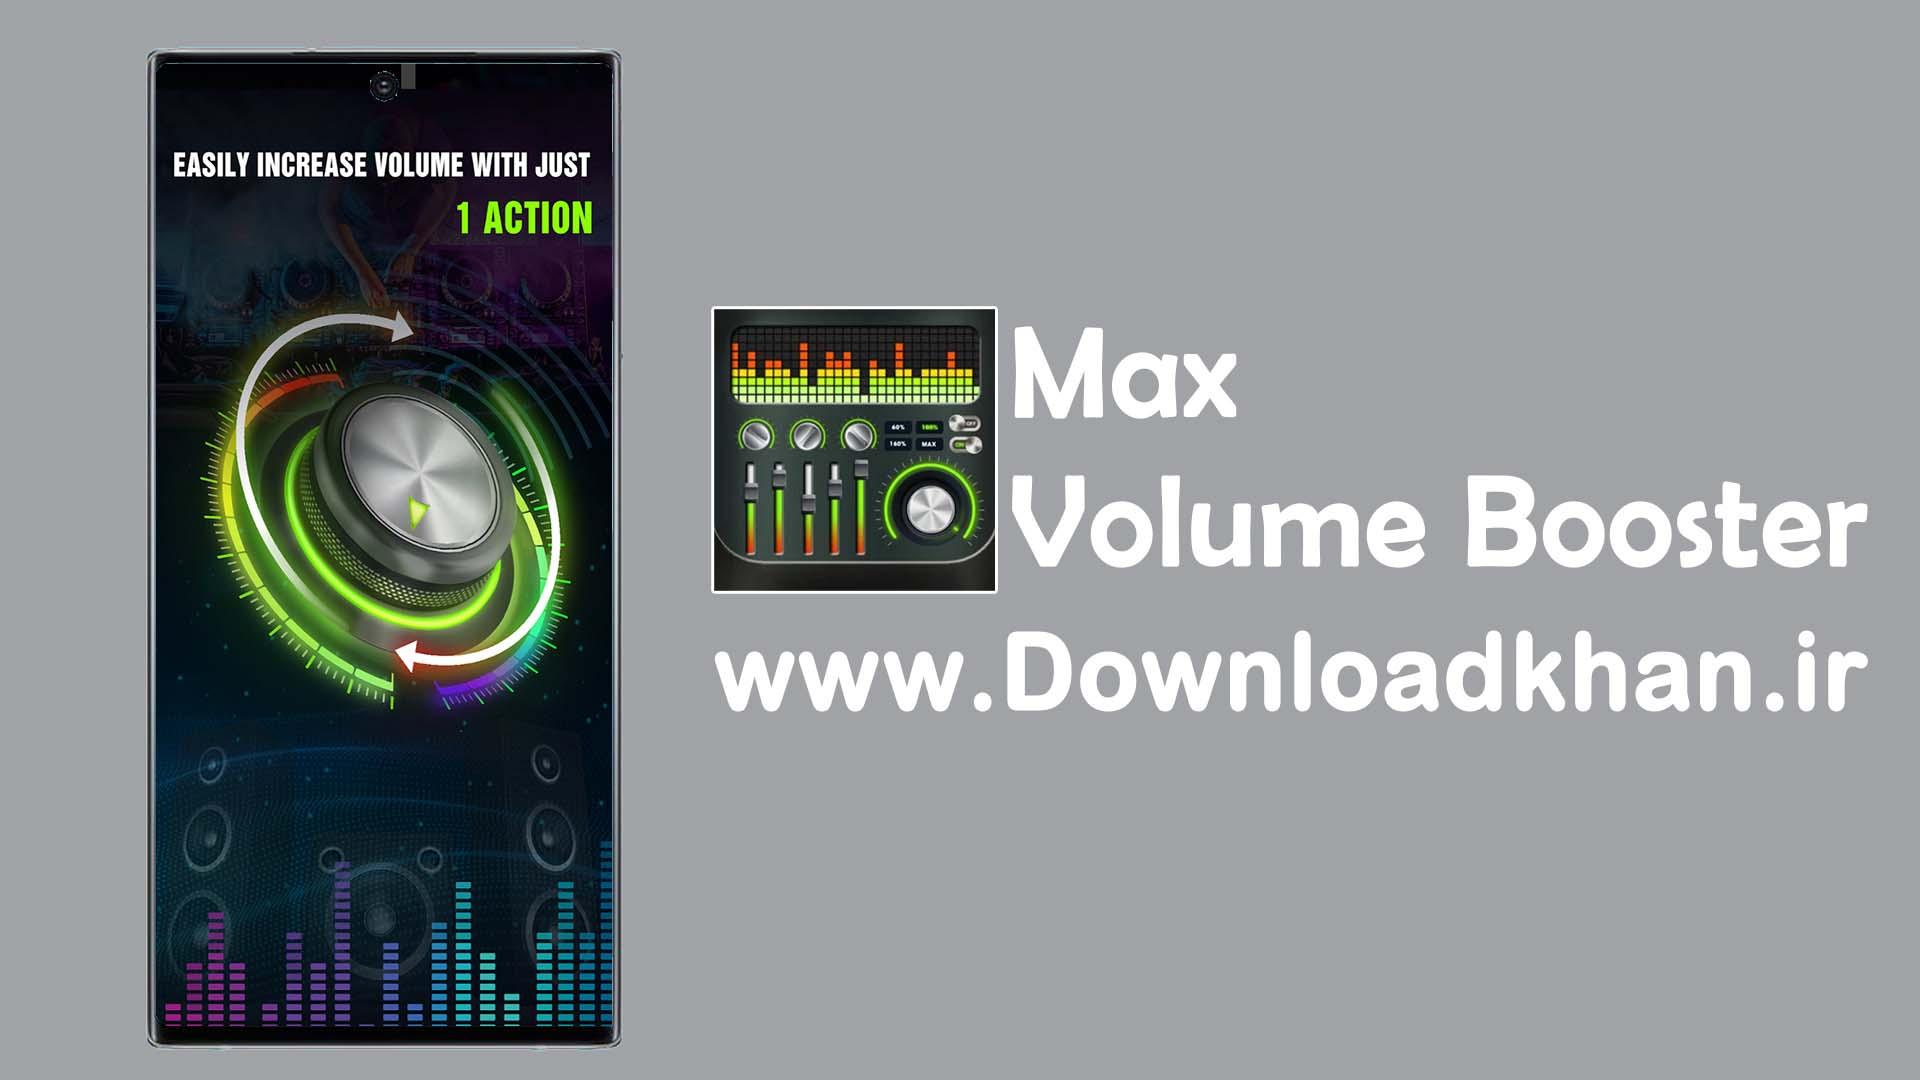 Max Volume Booster